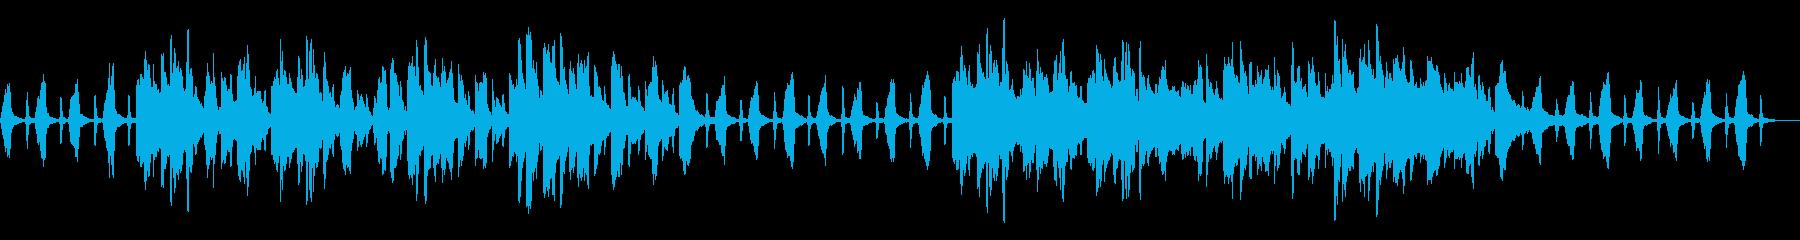 Nazoの再生済みの波形